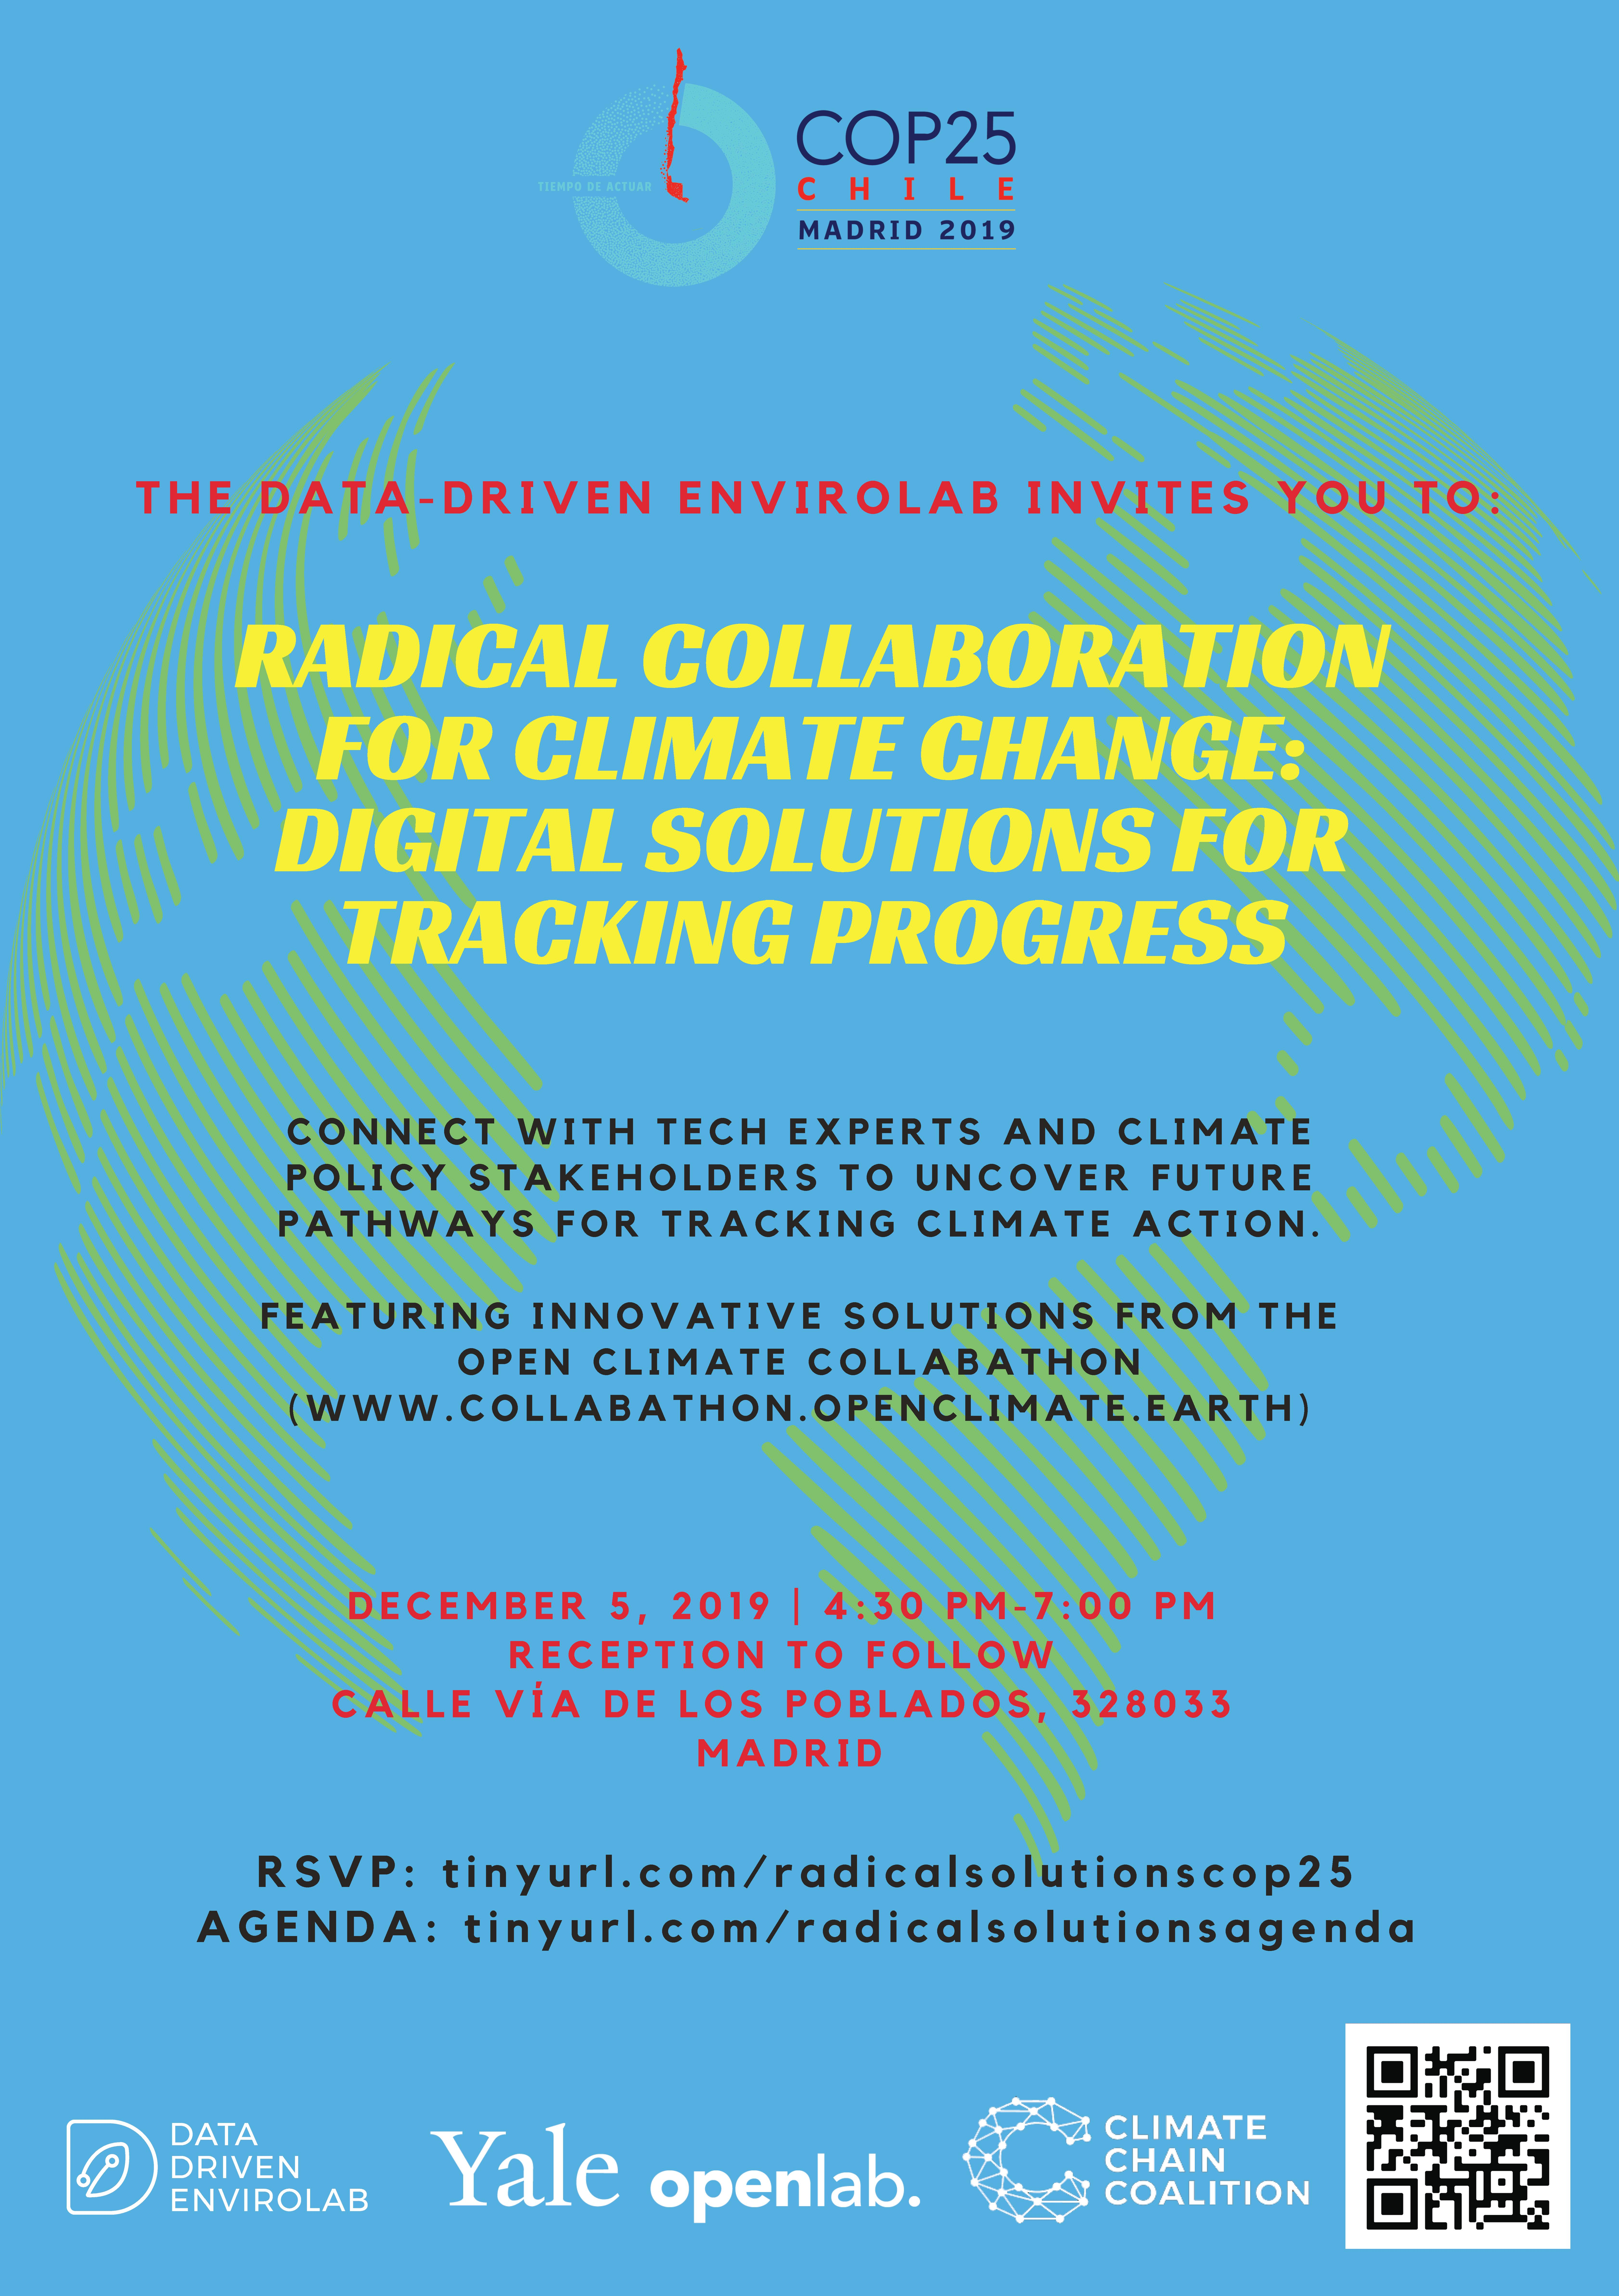 RSVP: Radical Collaboration for Climate Change – Digital Solutions for Tracking Progress @ COP-25